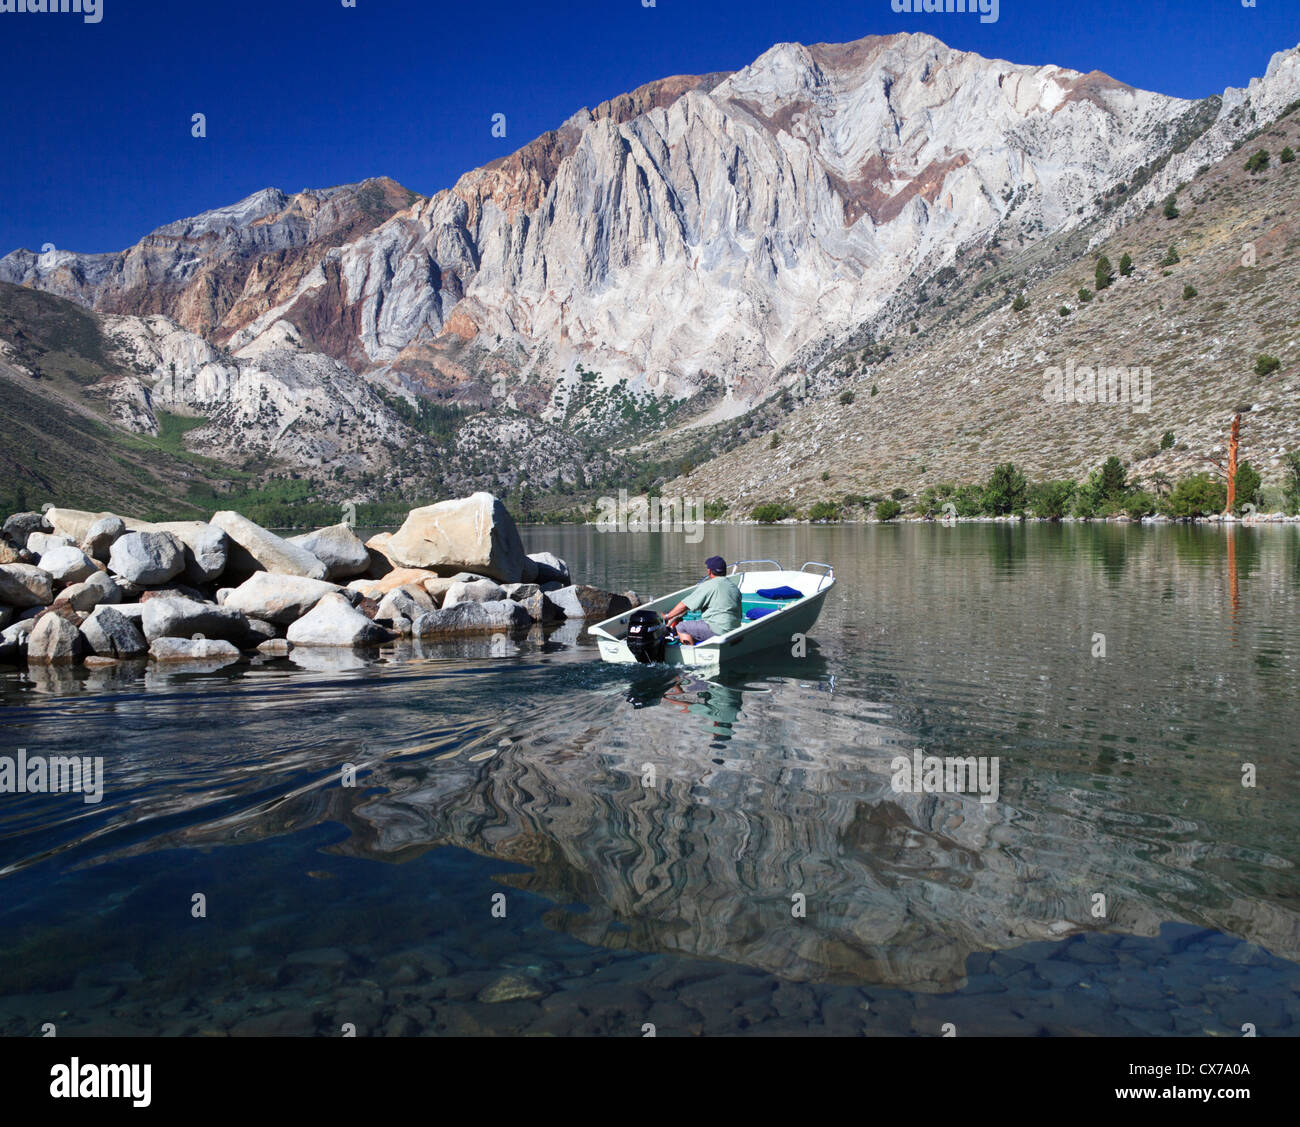 fisherman in boat at convict lake in northern california near